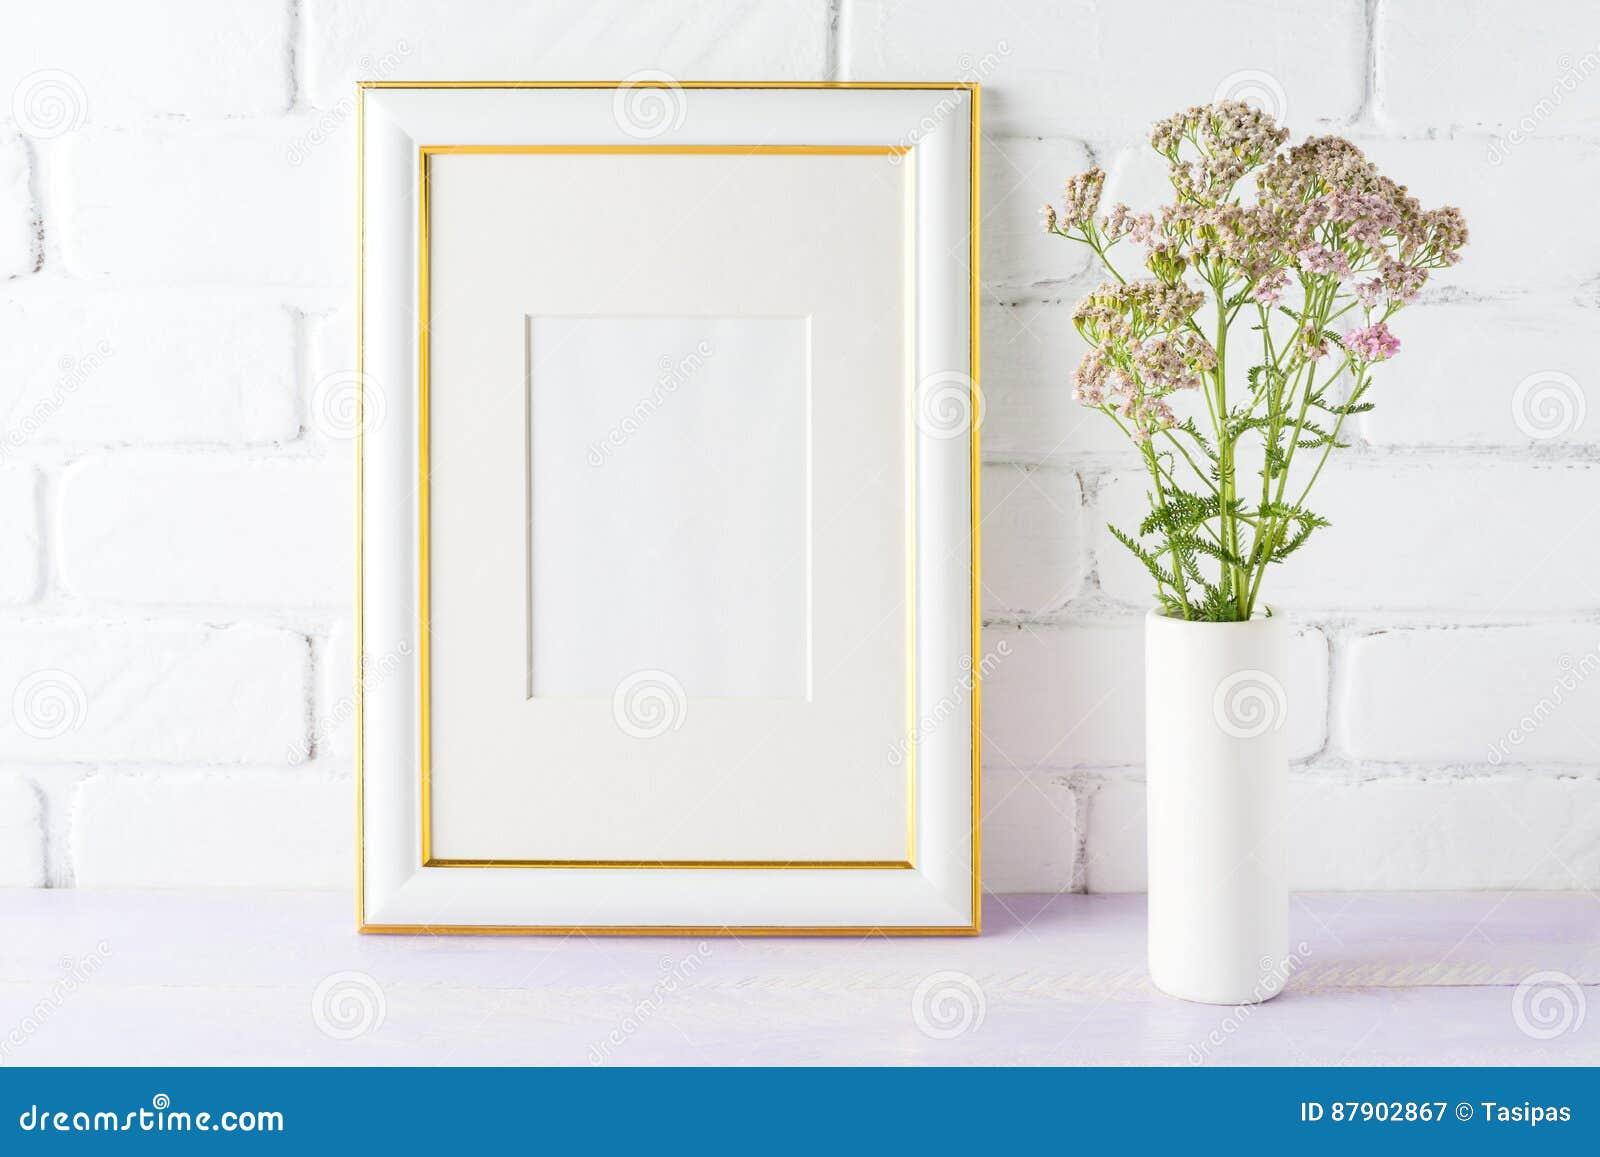 Gold Decorated Frame Mockup With Pink Flowers In Cylinder Vase Stock Image Image Of Arrangement Brick 87902867